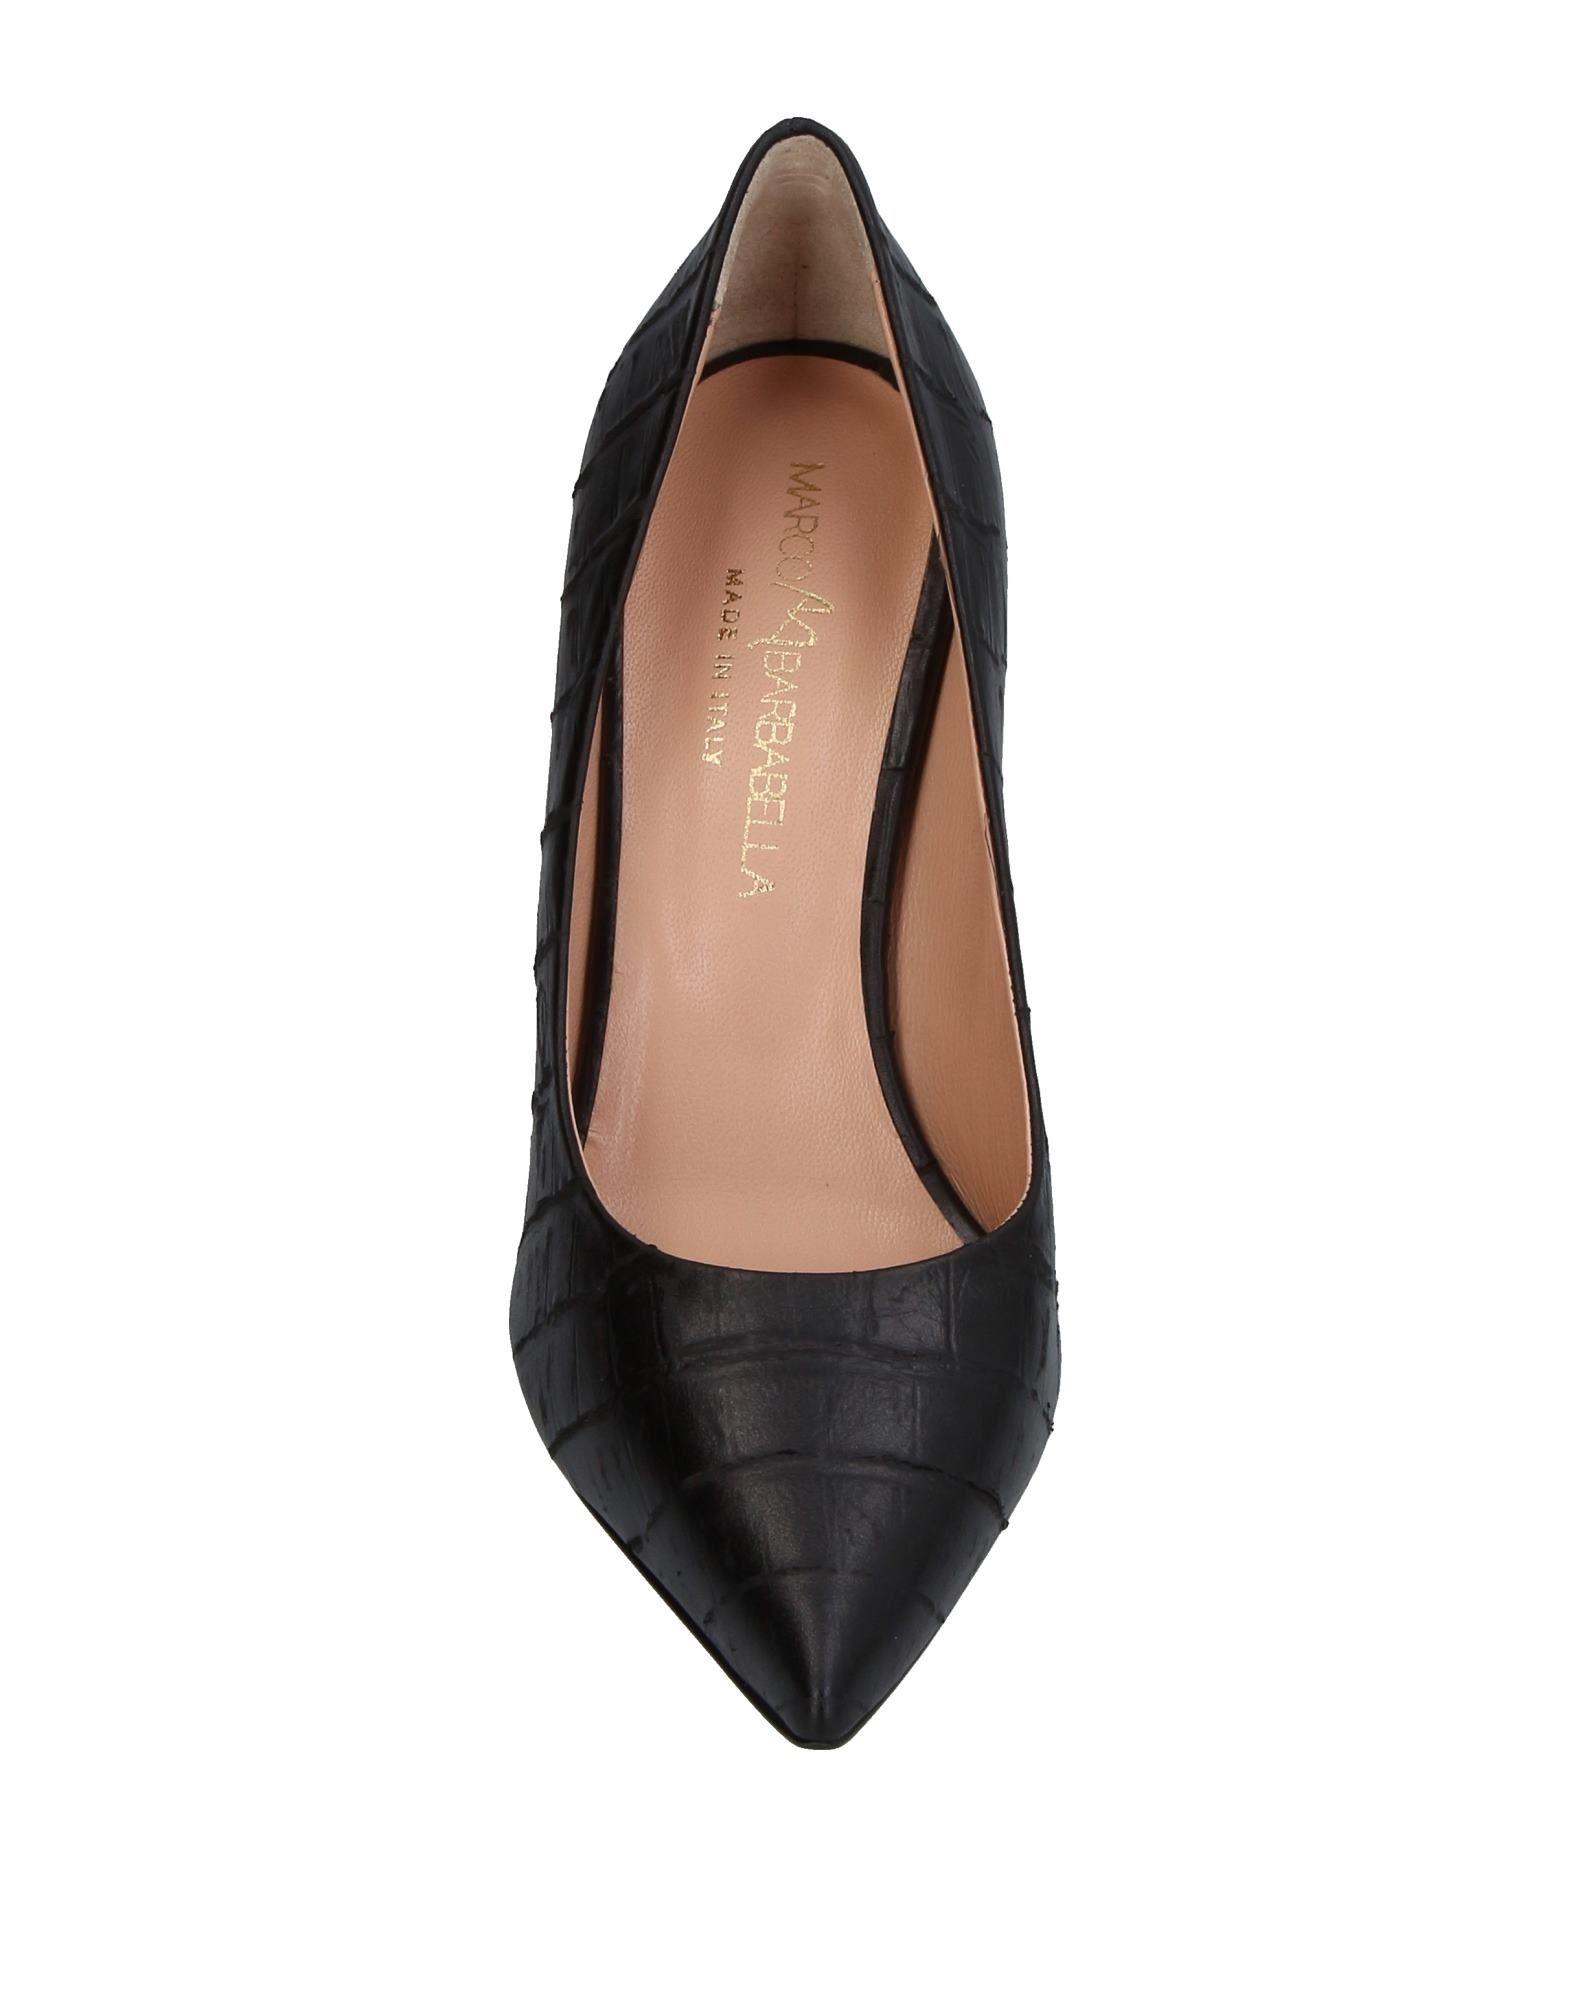 Stilvolle Pumps billige Schuhe Marco Barbabella Pumps Stilvolle Damen  11380759TJ f0797a